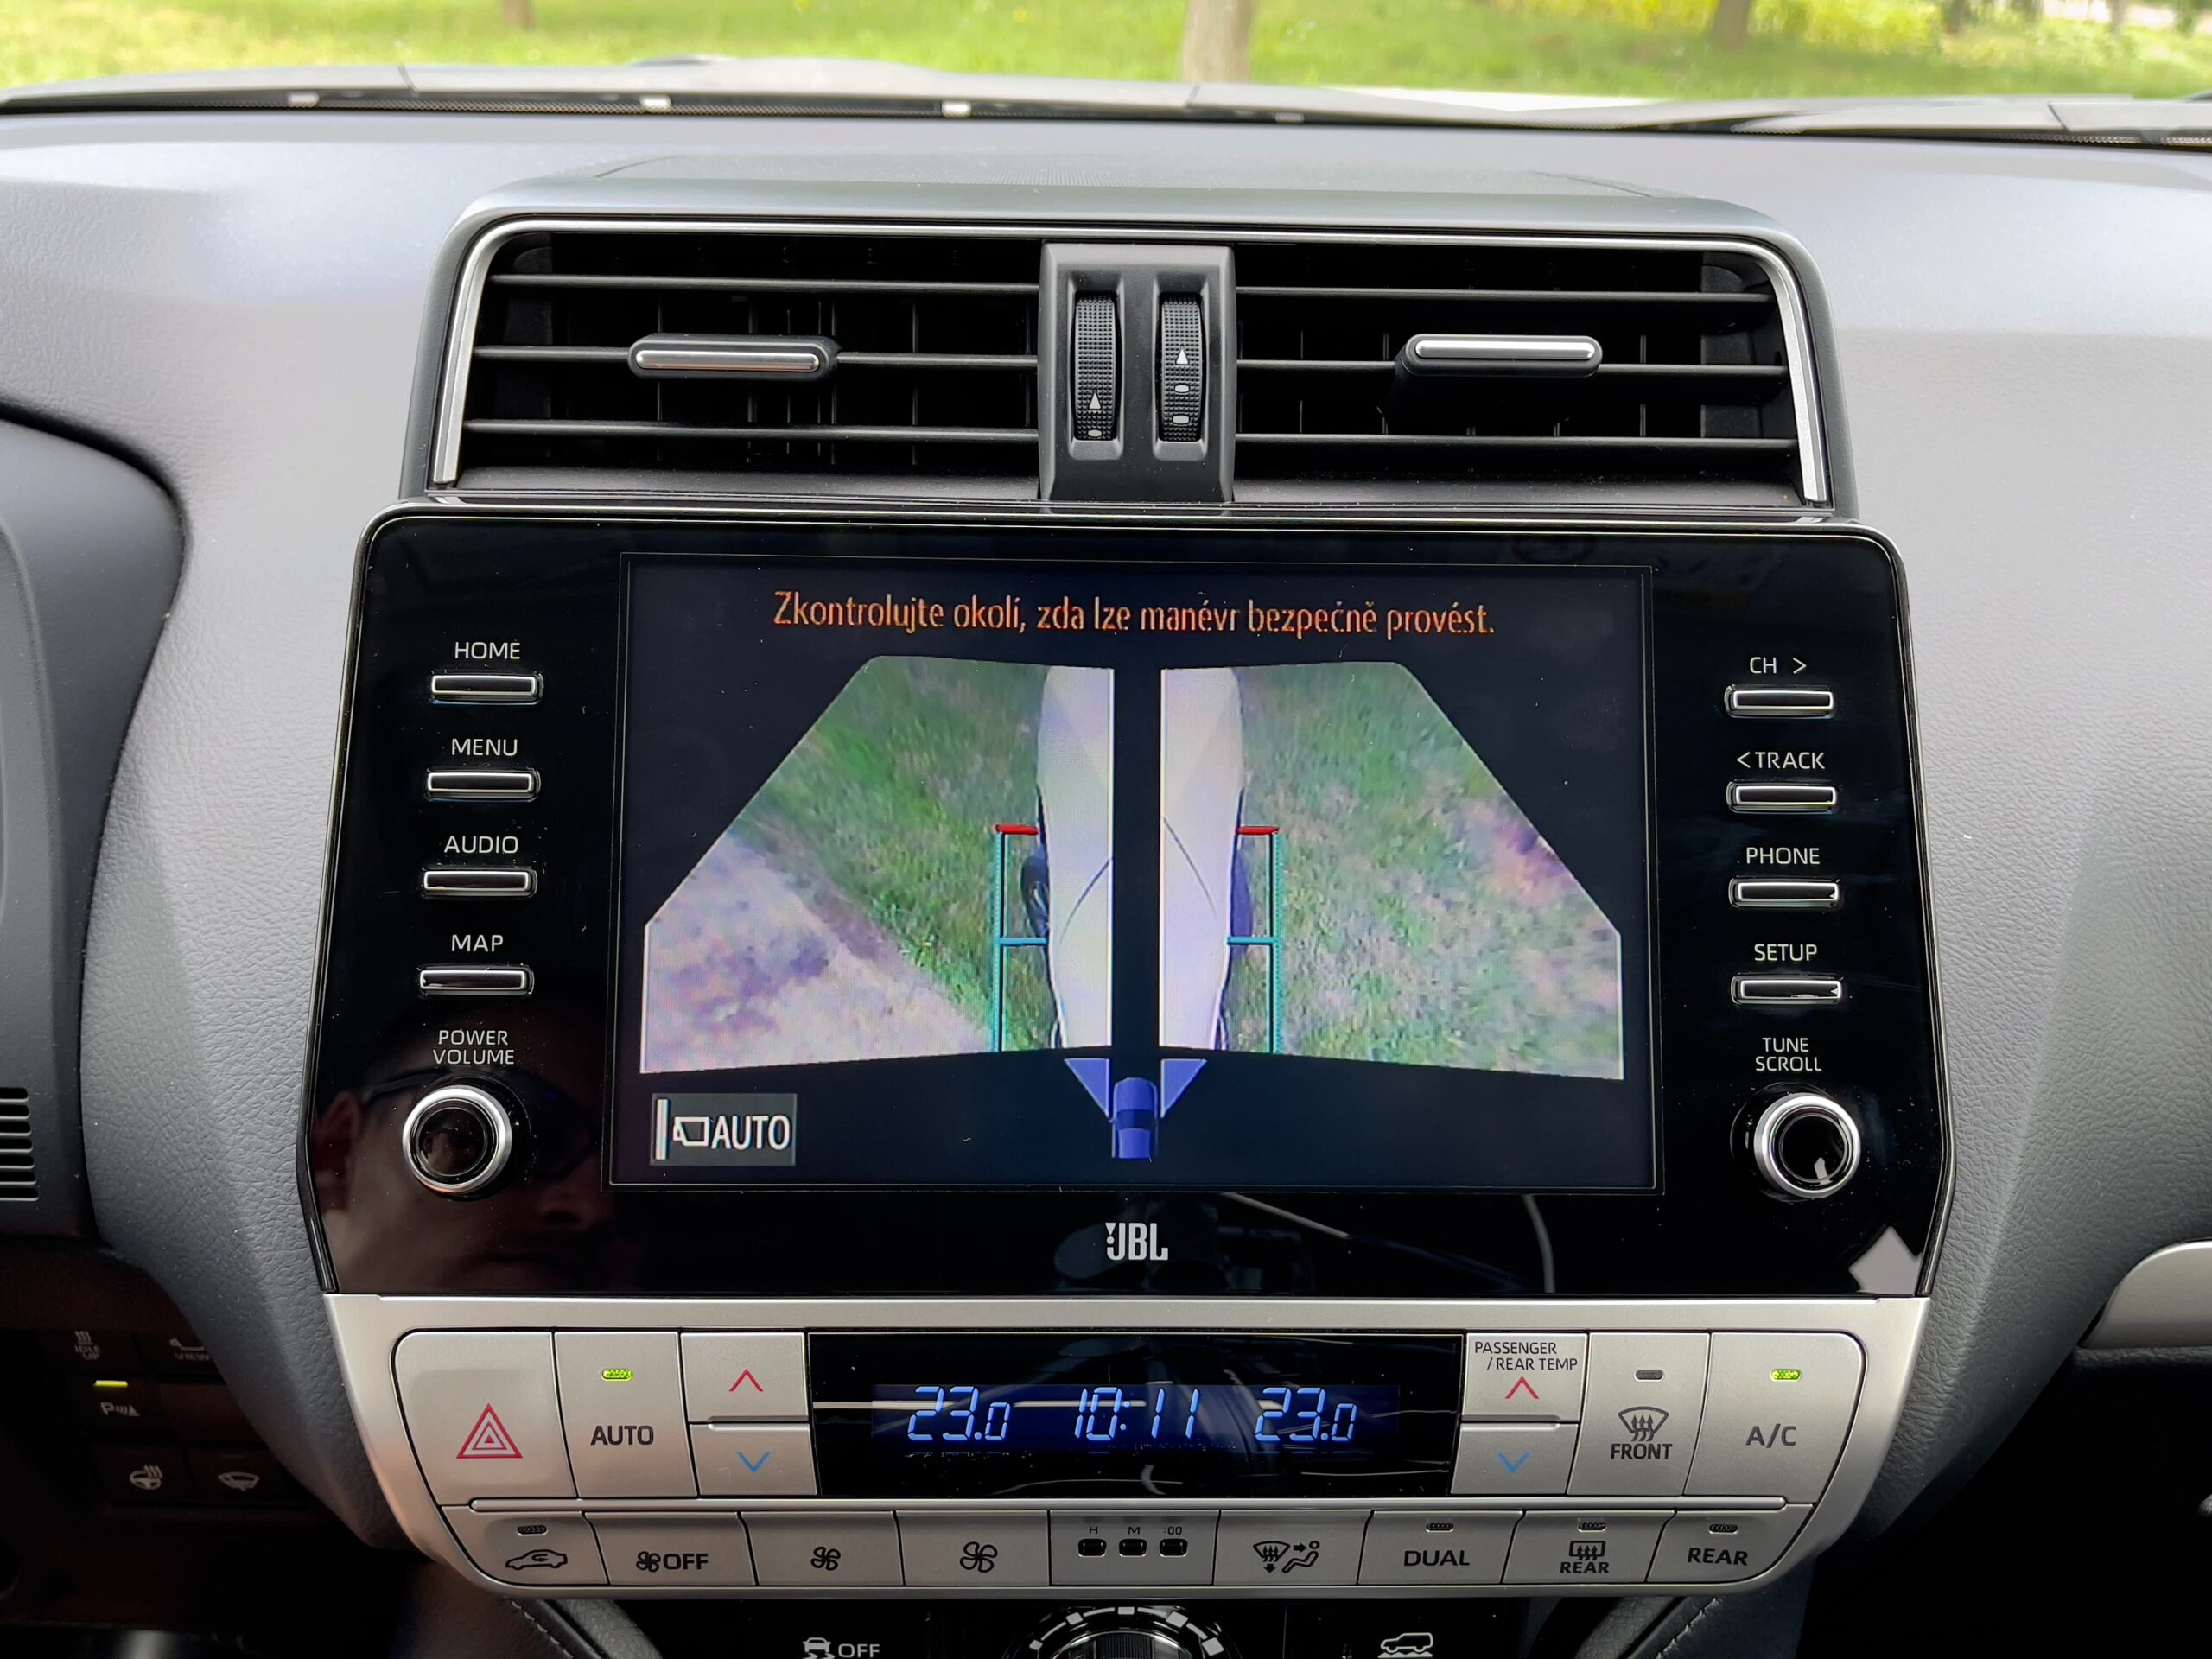 Toyota_Land_Cruiser_infotainment_1